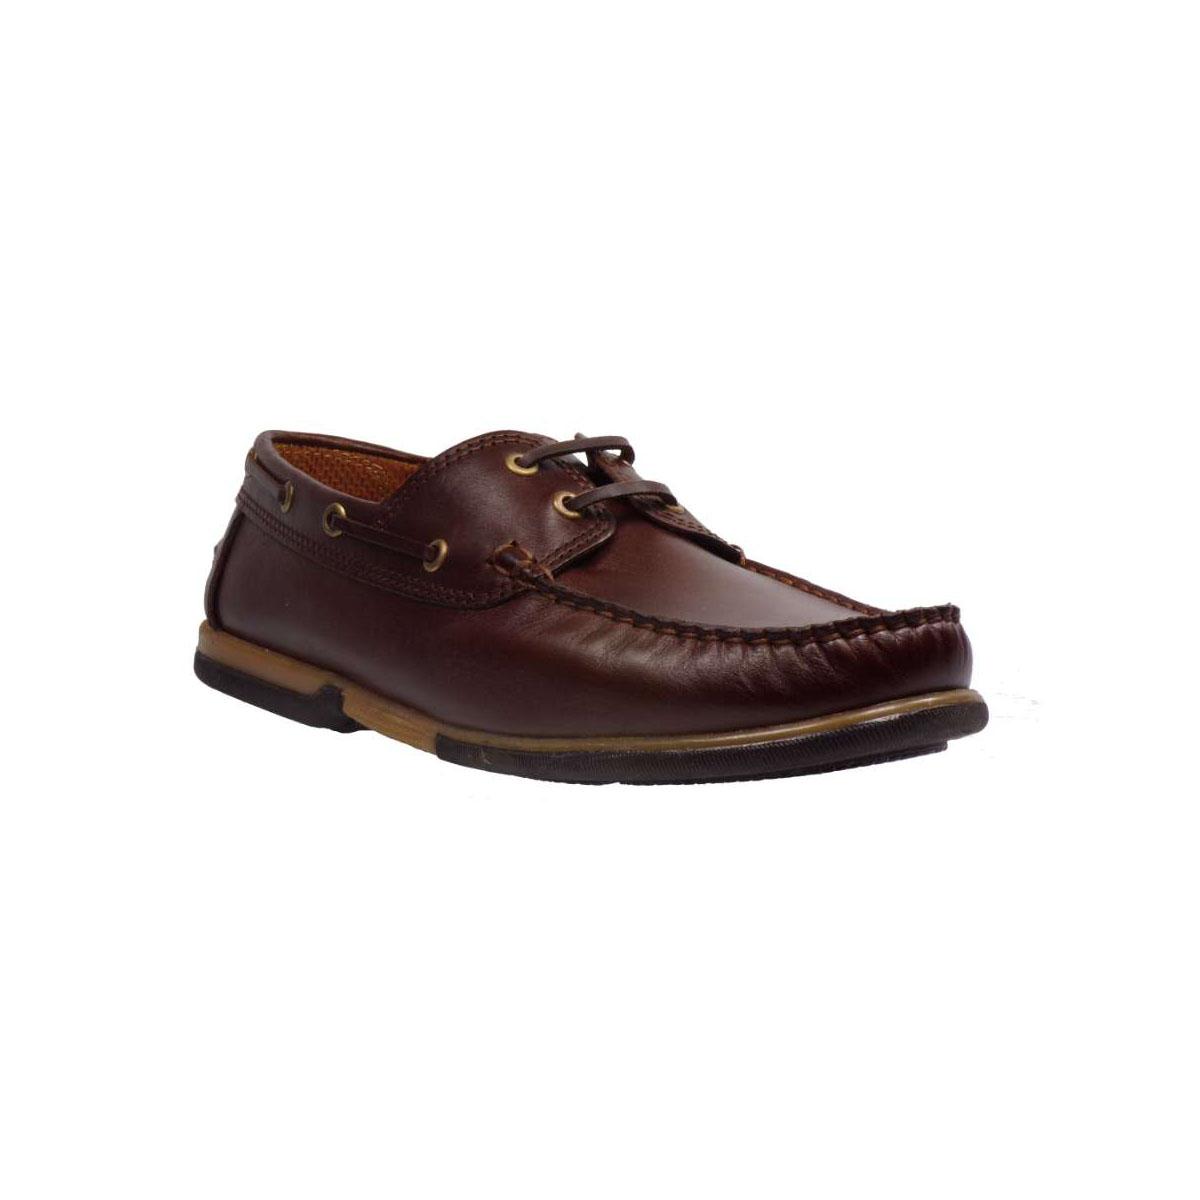 Riverland 1212 Boat Shoe Απο Γνήσιο Δέρμα Καφέ